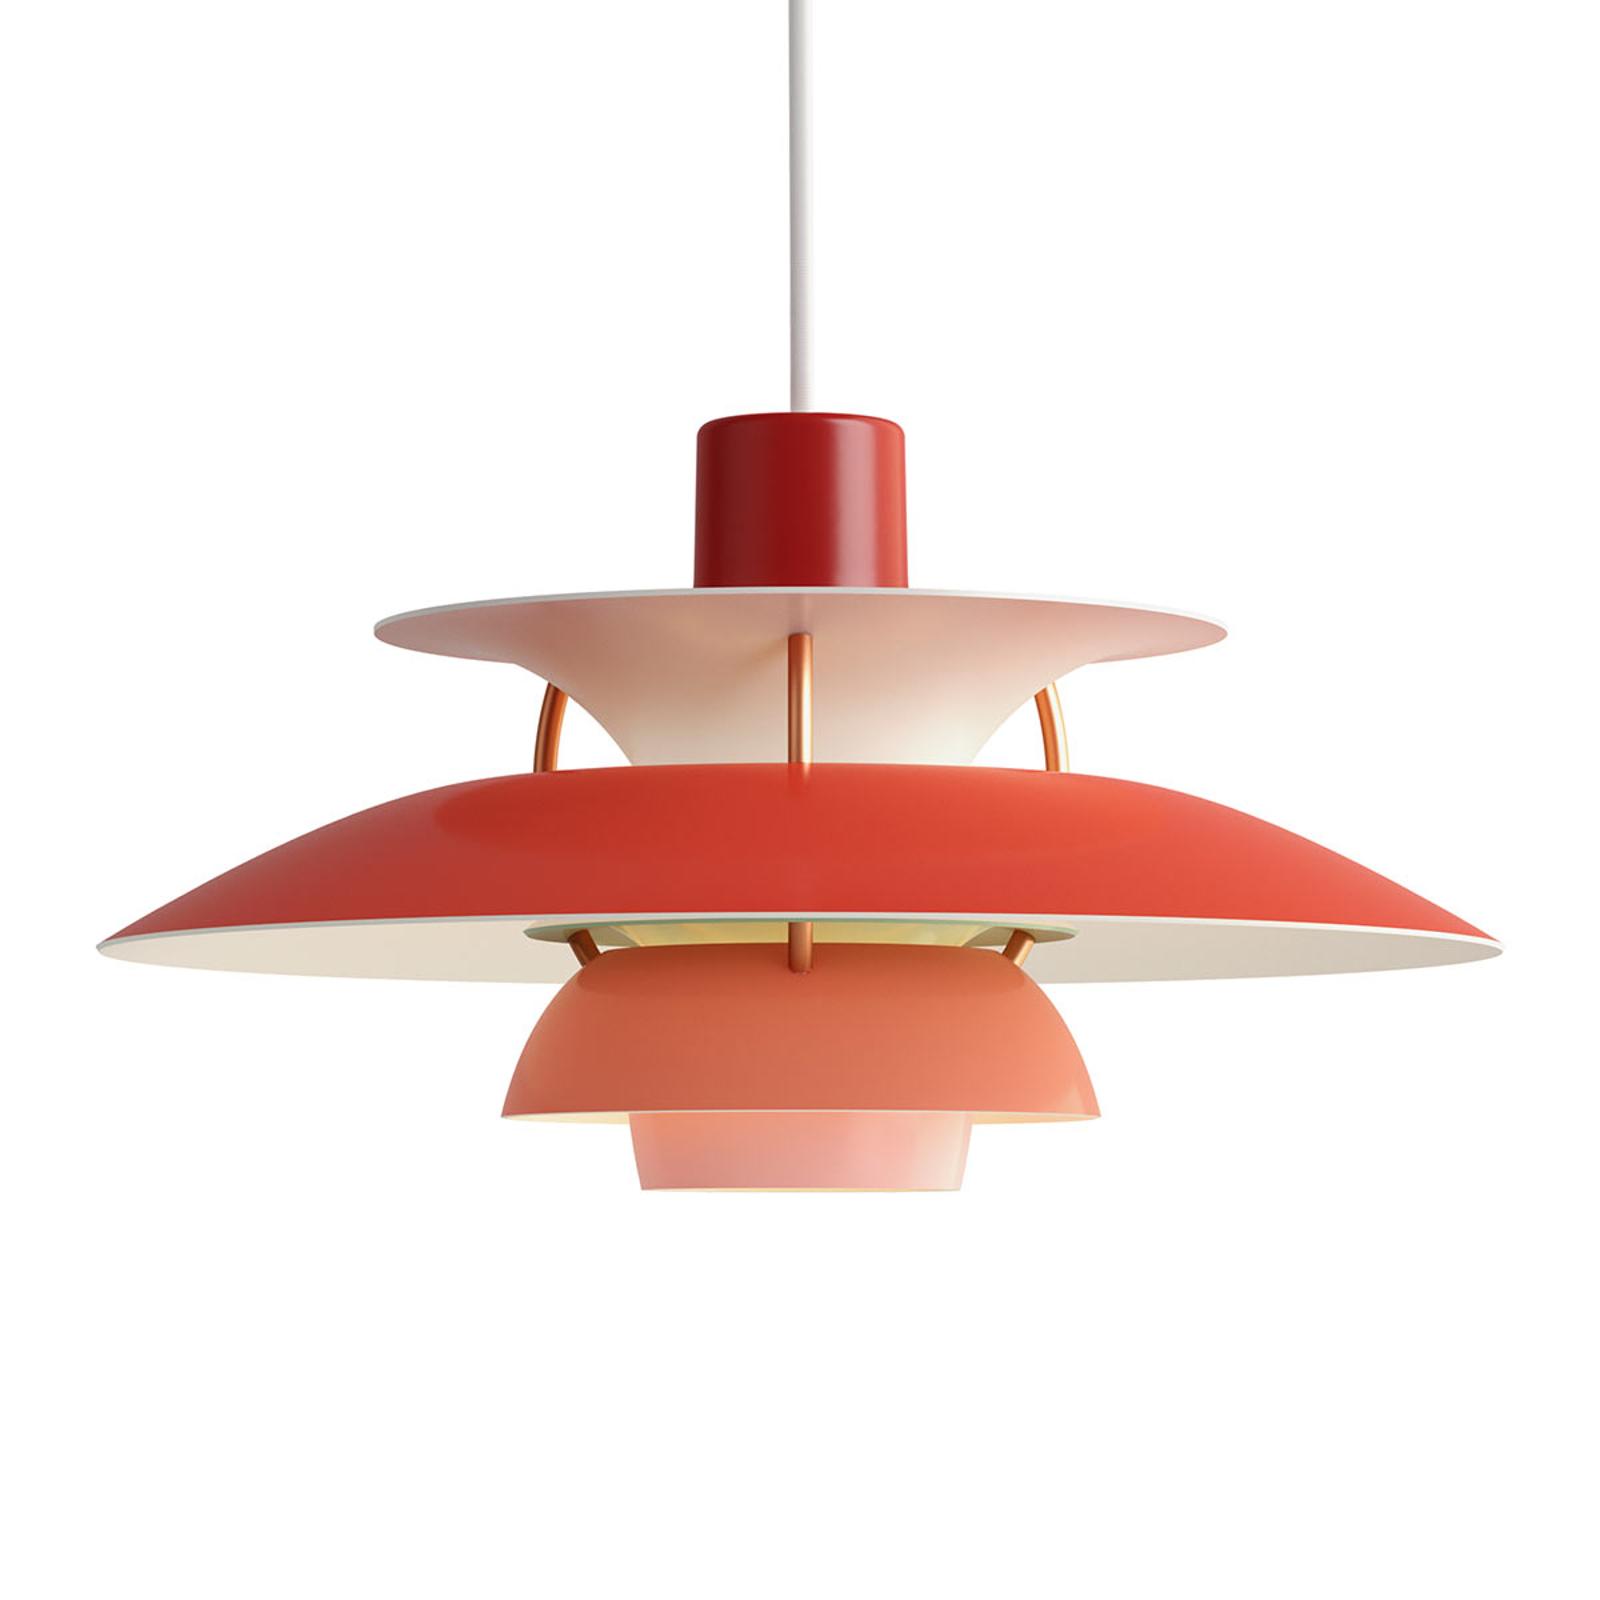 PH 5 Mini - Deense designer hanglamp, rood